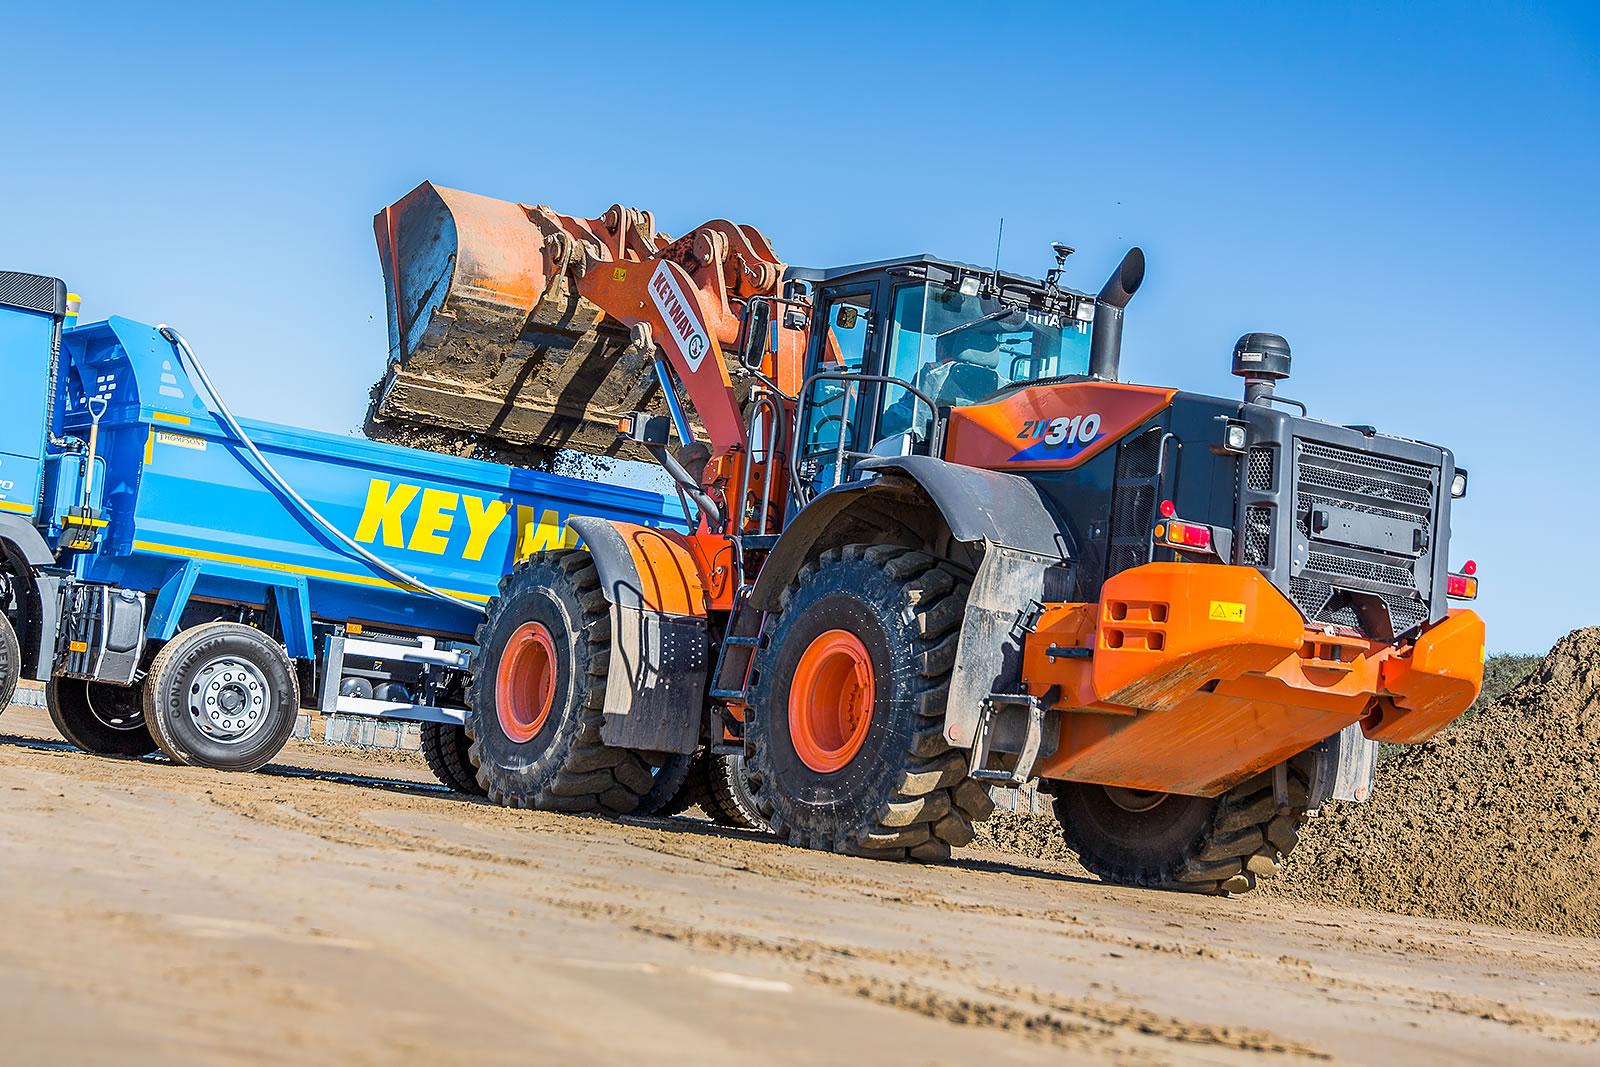 Hitachi ZW310-6 wheel loader unloading material on Weston beach